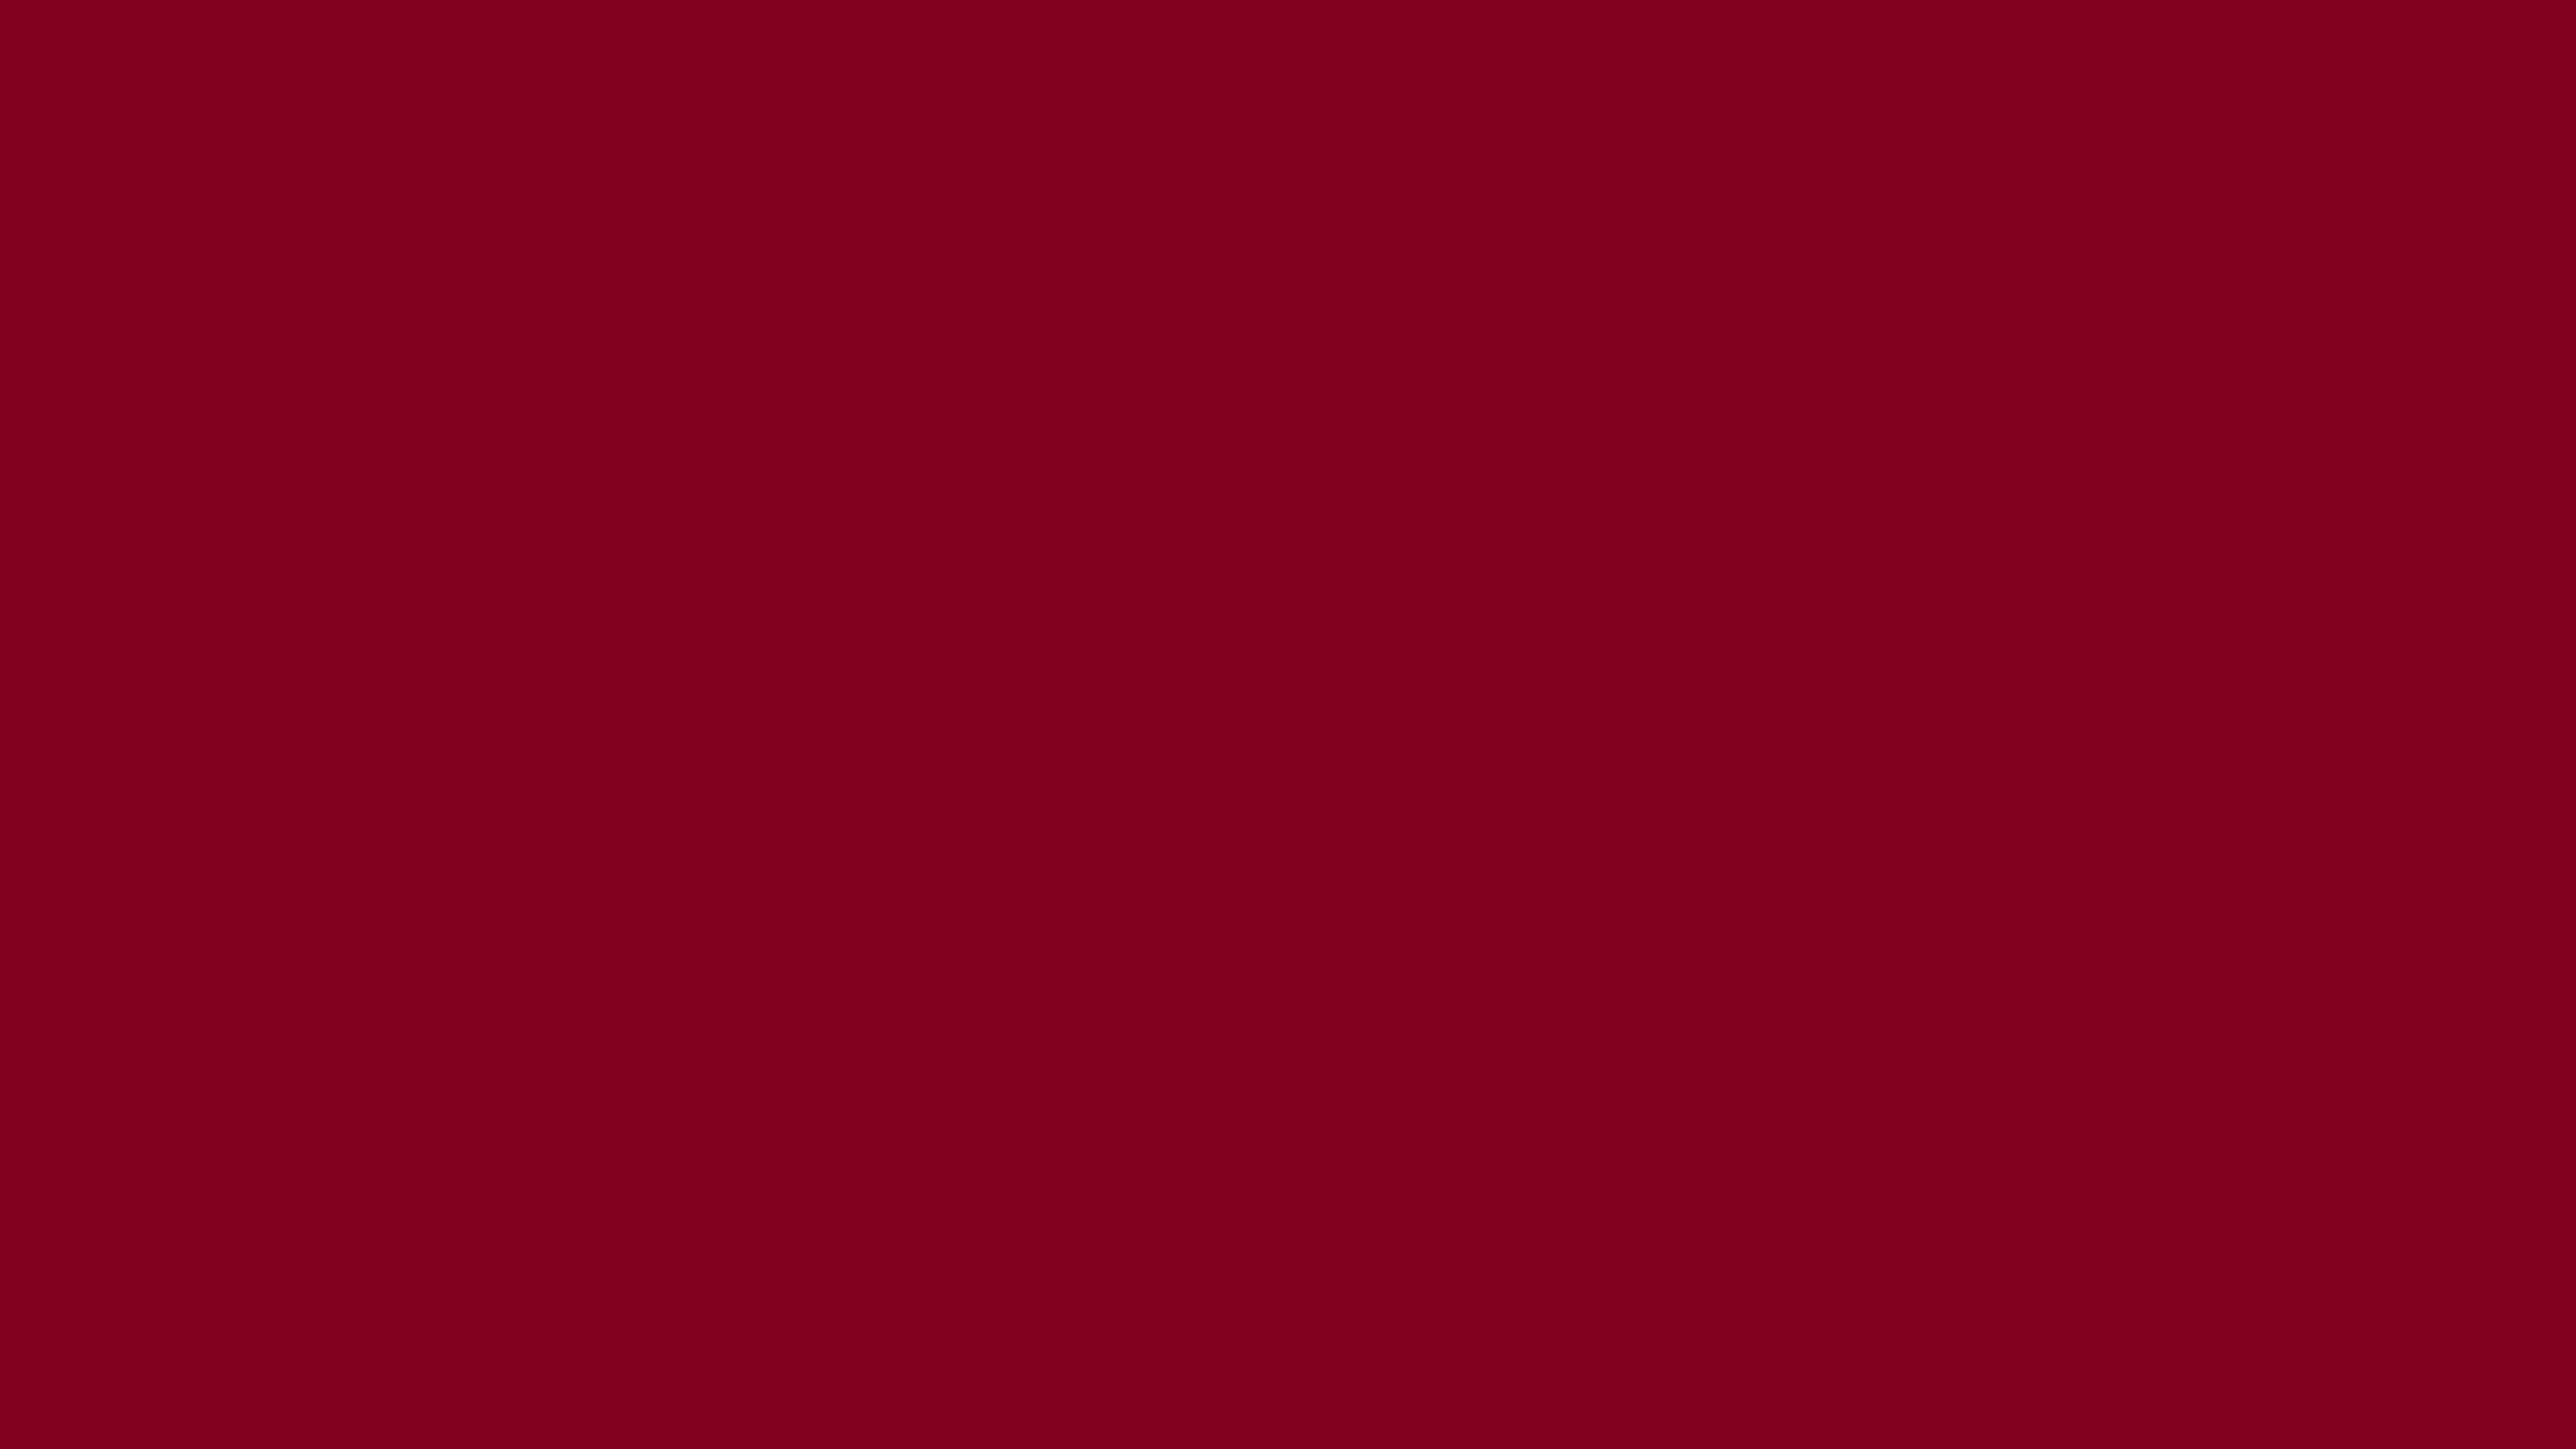 4096x2304 Burgundy Solid Color Background